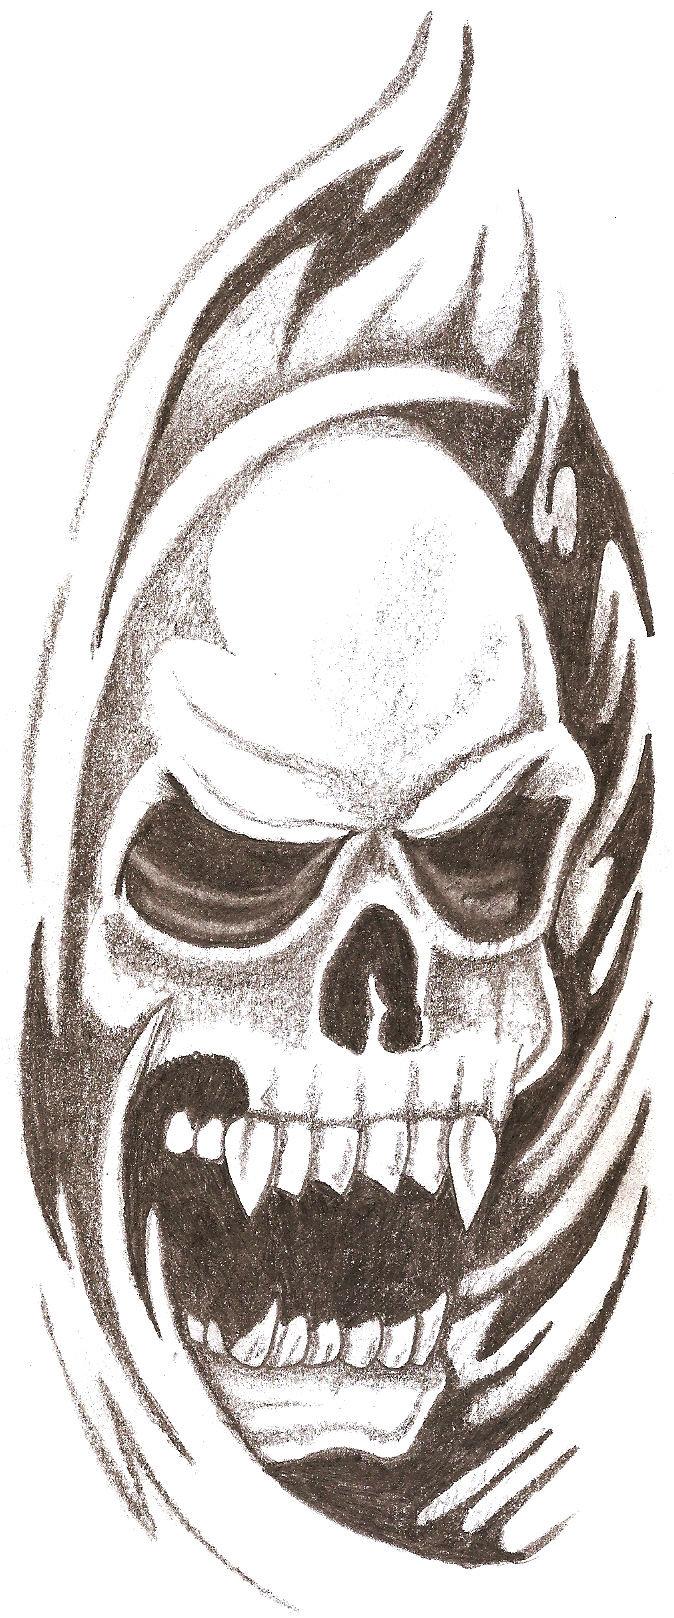 Cool Skull Sketch : skull, sketch, Skull, Drawing, GetDrawings, Download